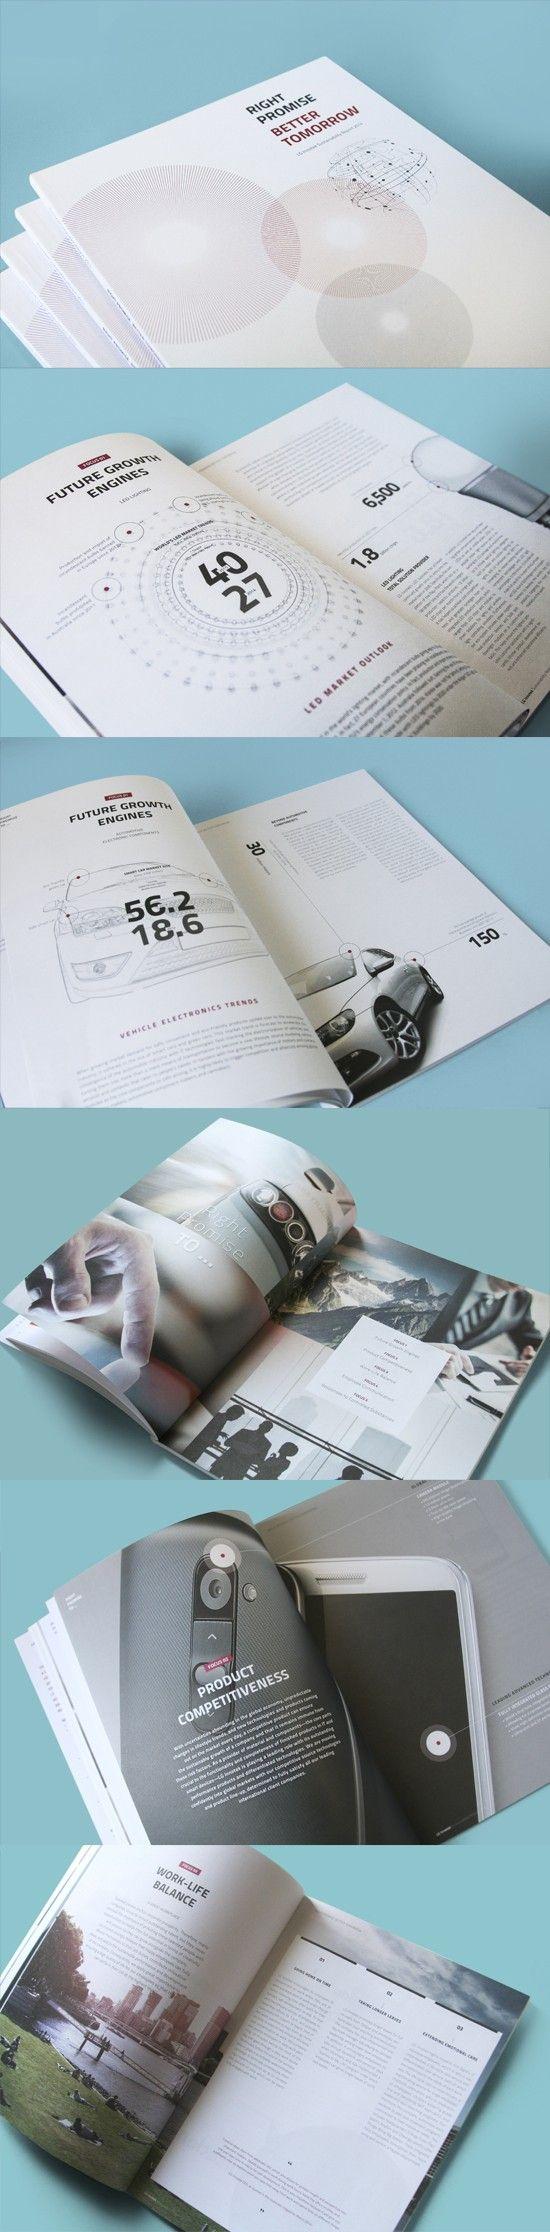 LG Innotek Sustainability Report 2014-1